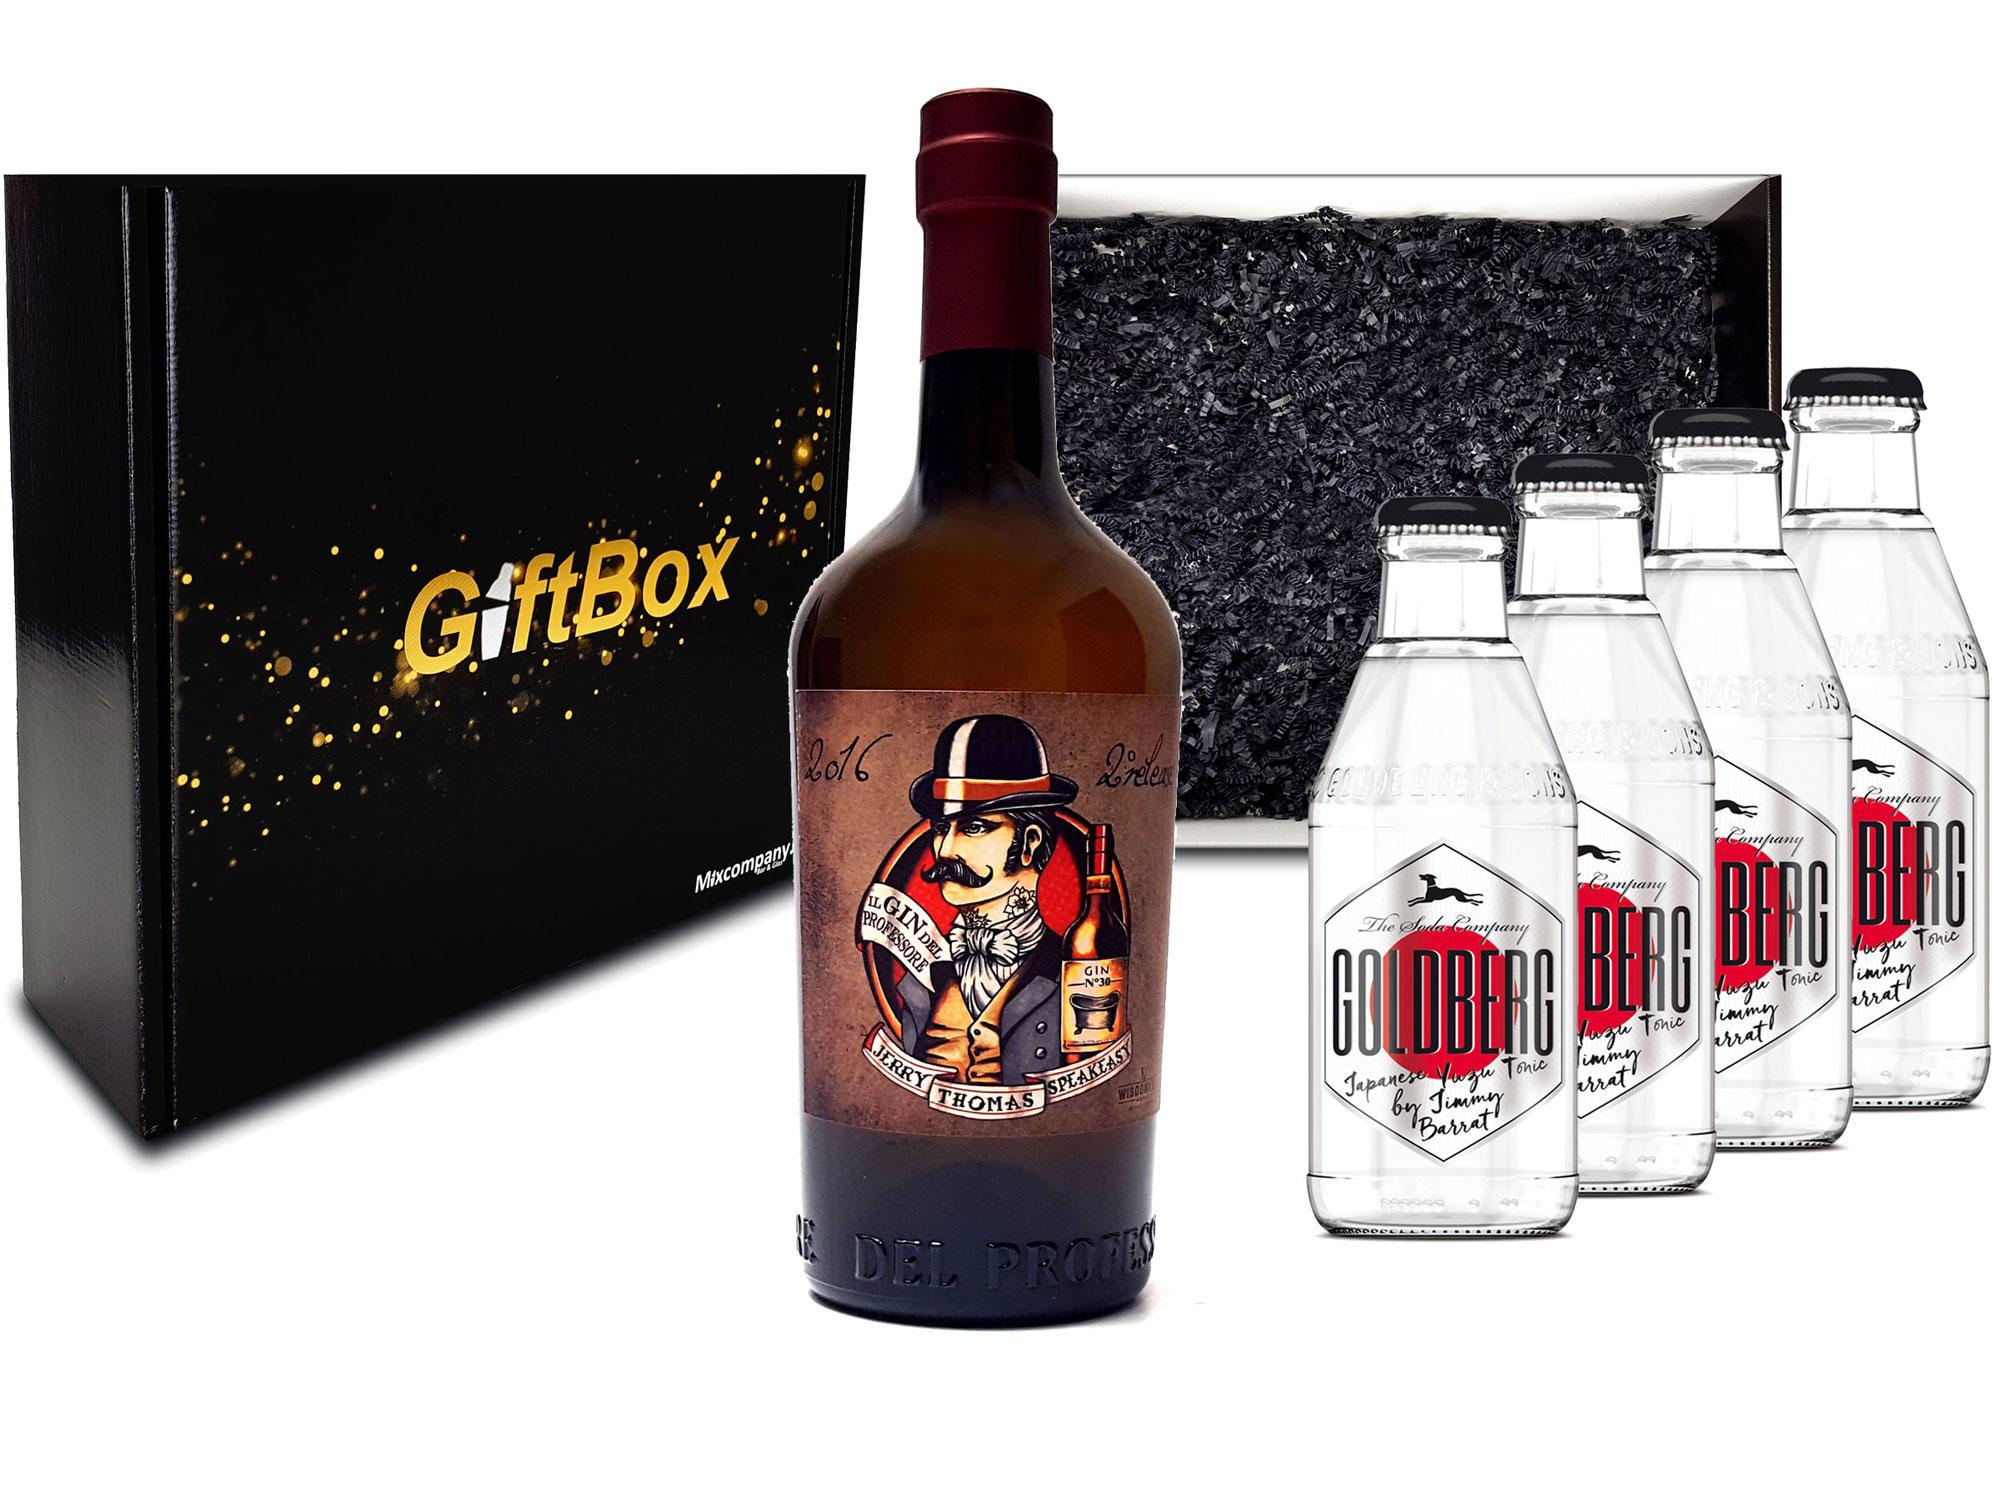 Gin Tonic Giftbox Geschenkset - Gin del Professore Monsieur 0,7l 700ml (43,7% Vol) + 4x Goldberg Japanese Yuzu Tonic Water 200ml inkl. Pfand MEHRWEG - [Enthält Sulfite]